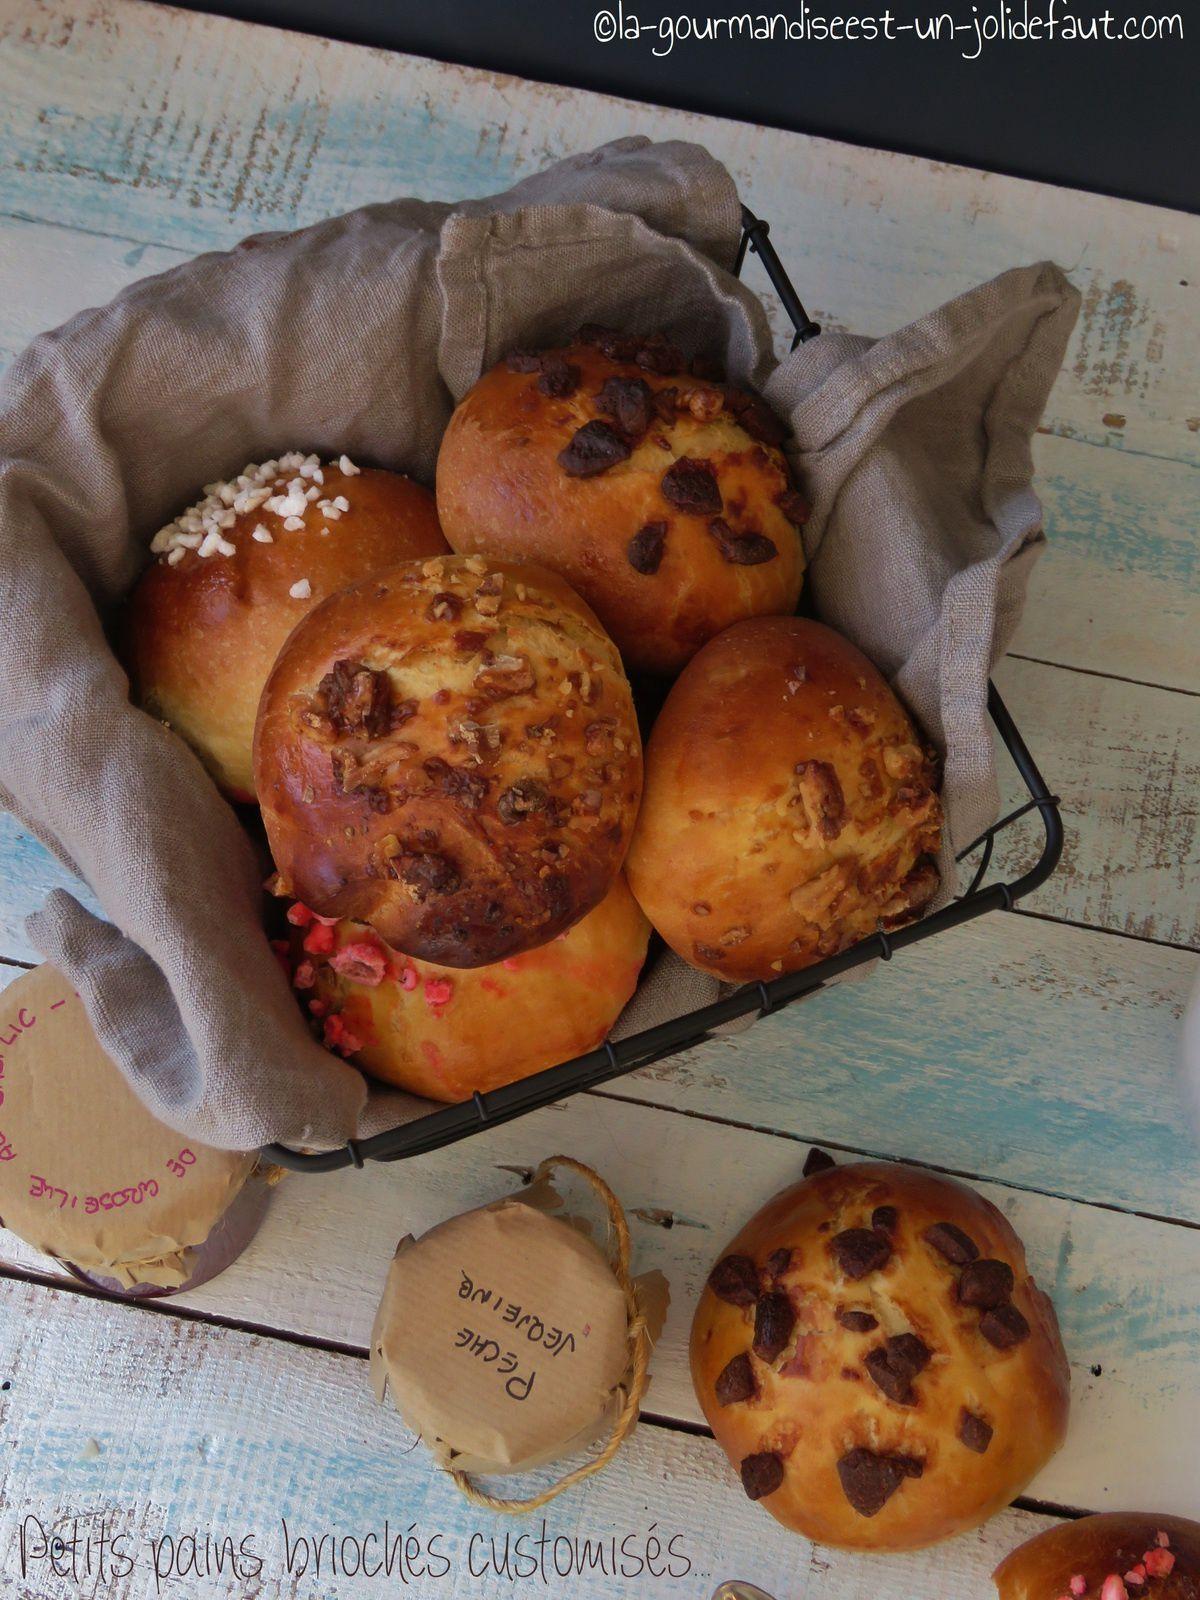 Petits pains briochés customisés